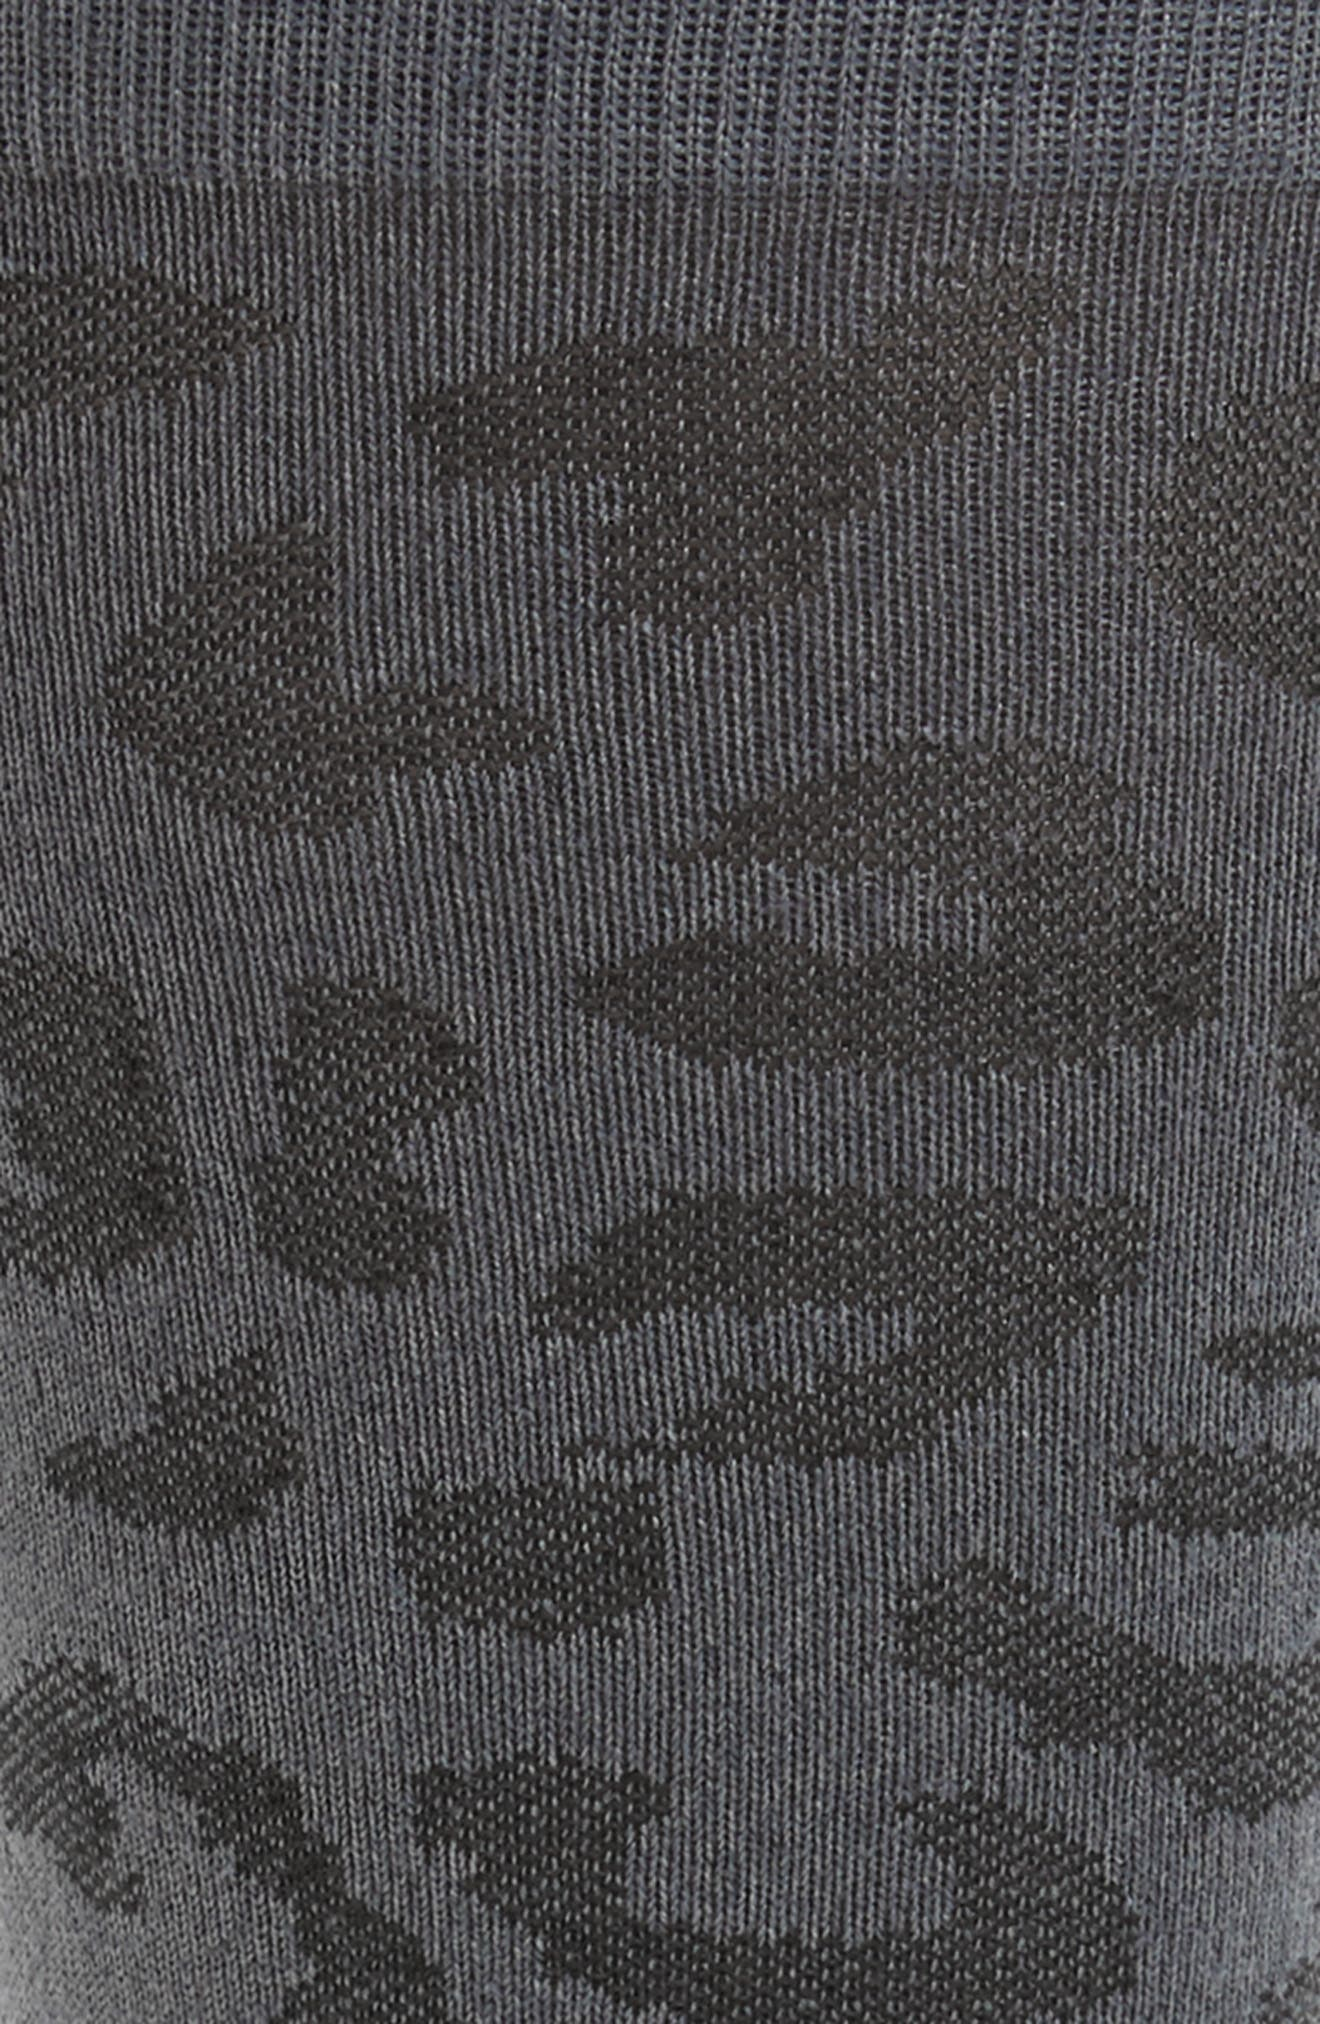 Okaes Socks,                             Alternate thumbnail 2, color,                             030